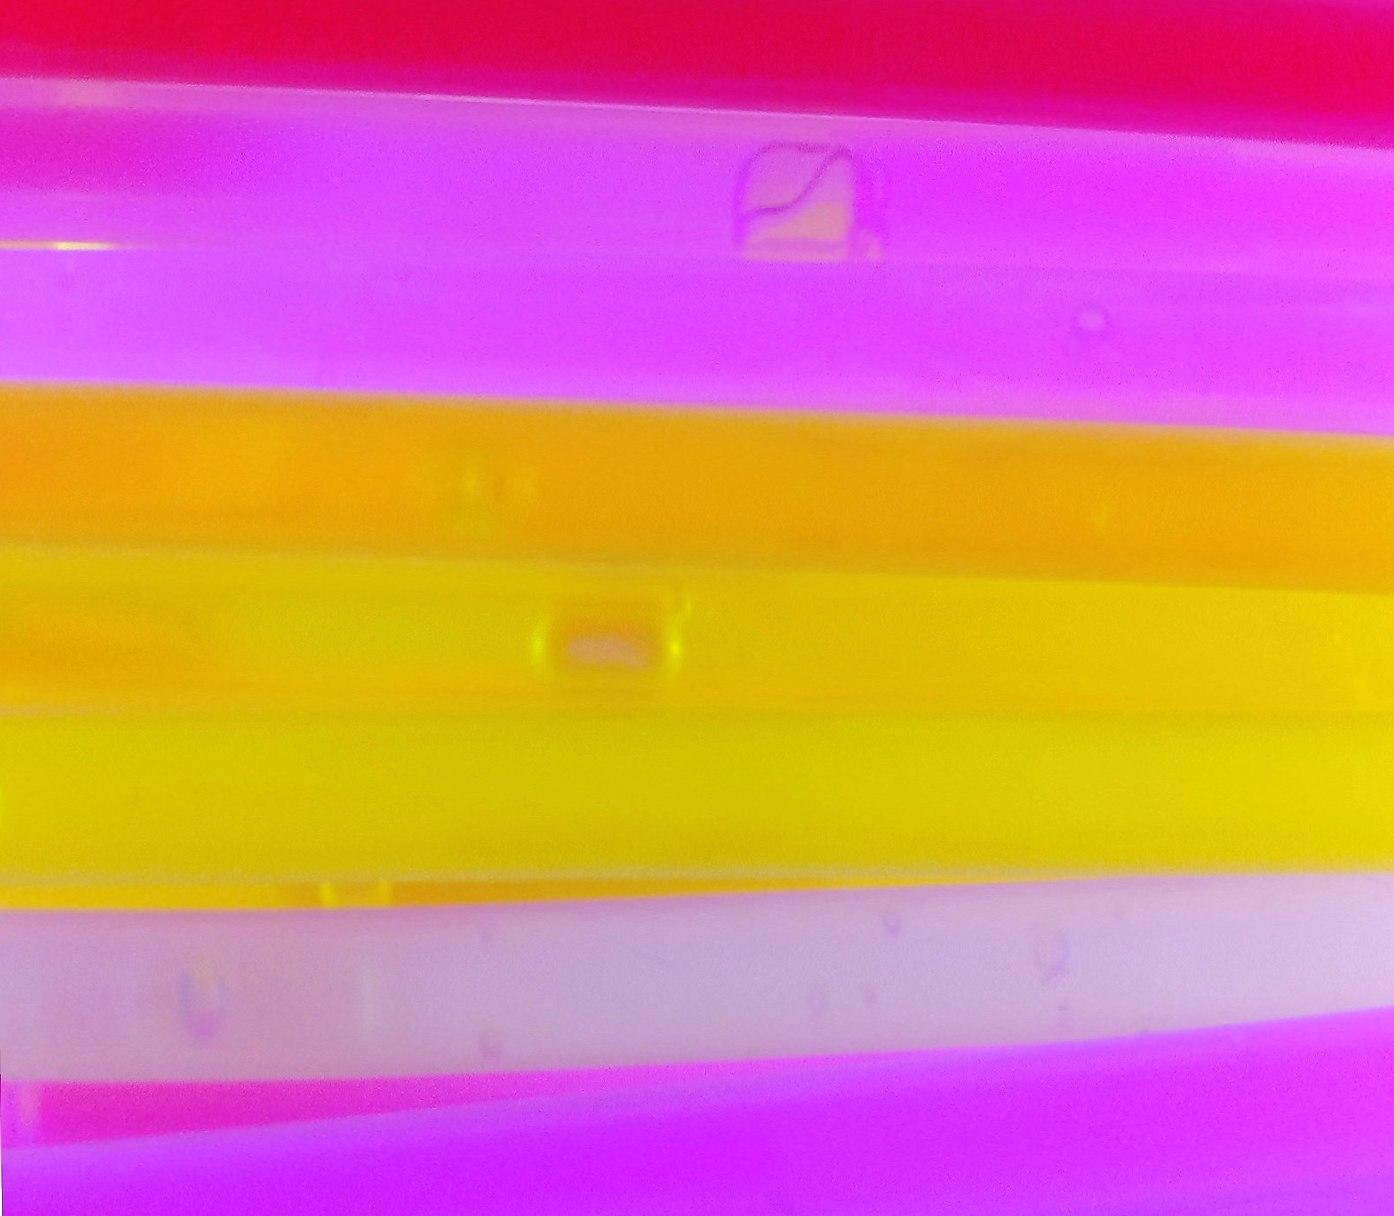 Neon glow rainbow wallpapers HD quality